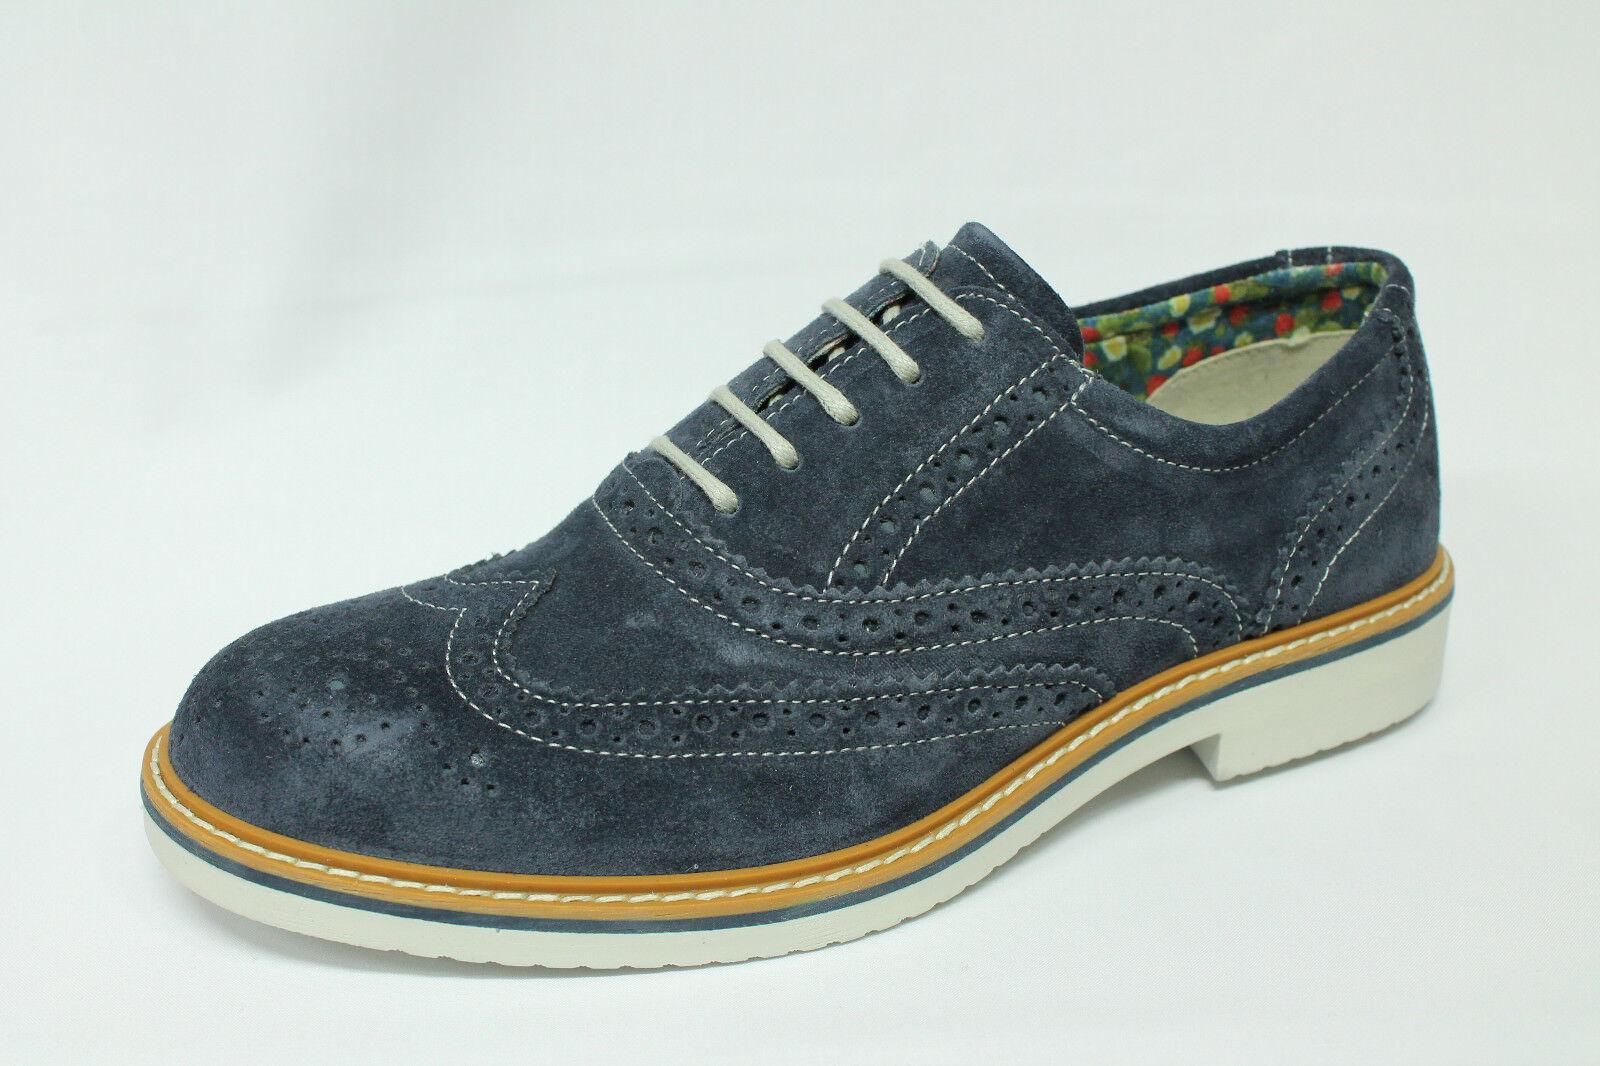 Stringate Igi&co 1106200 camoscio blue Made in  listino - 20%